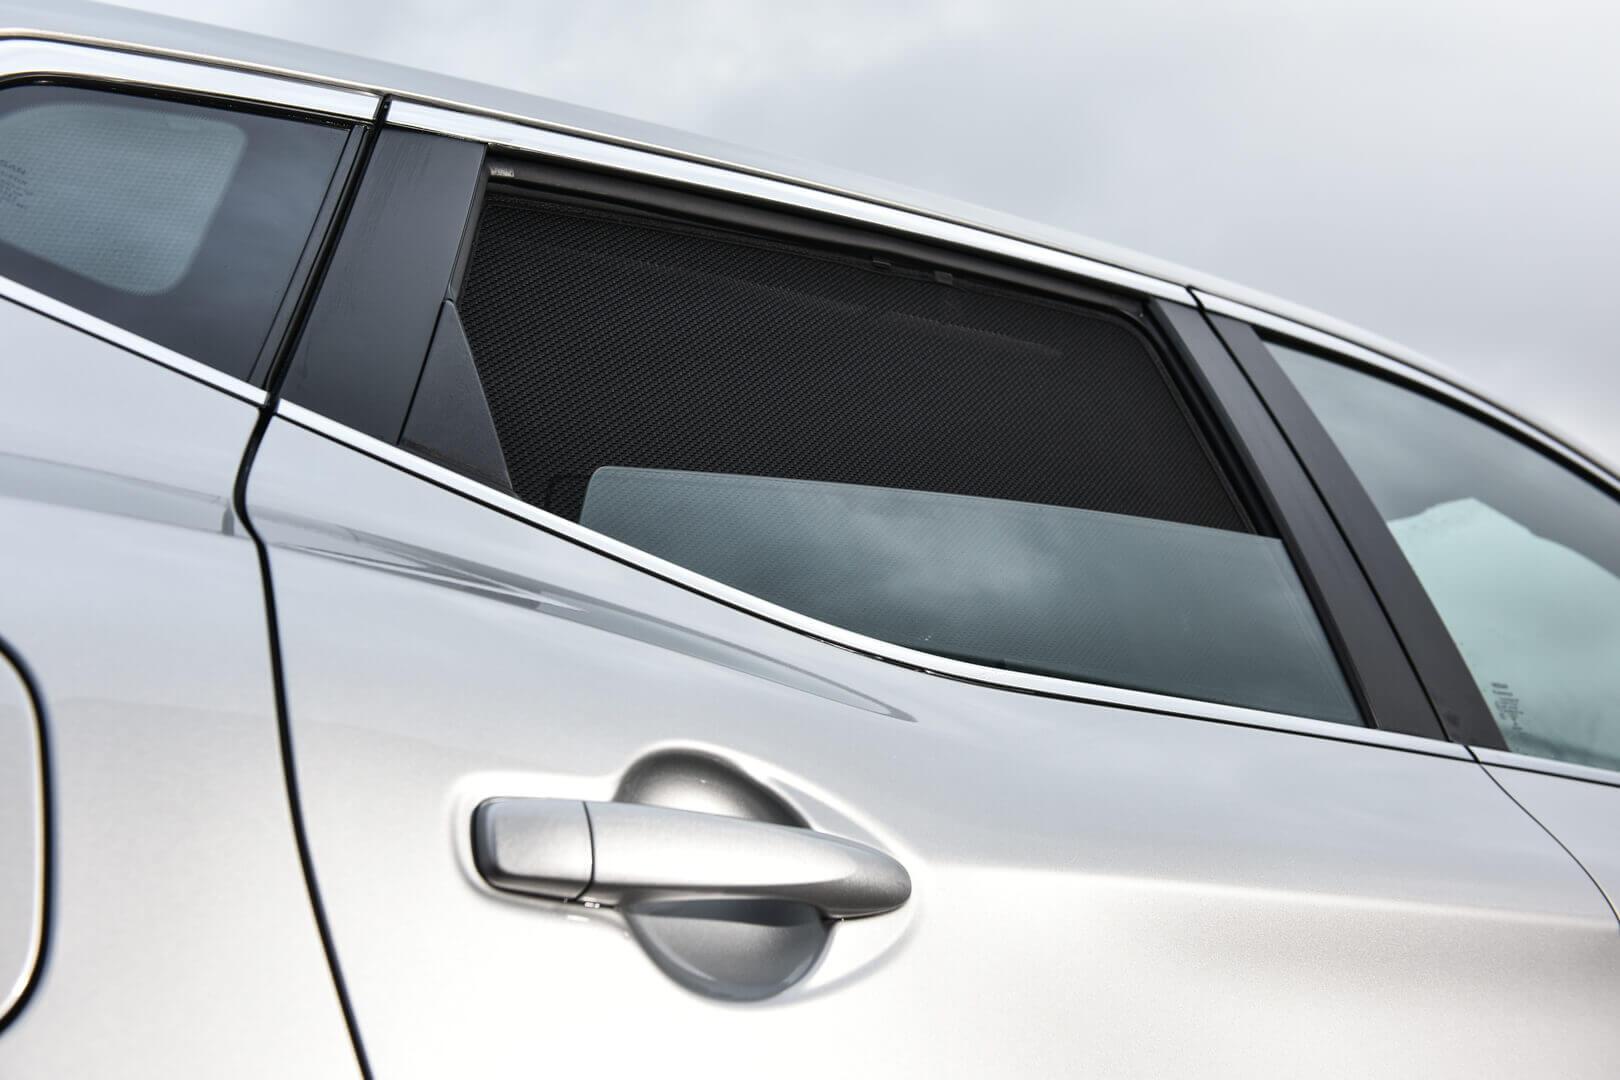 Car Window Sun Blinds Privacy UV Shades Volvo XC70 5 Door 01-07